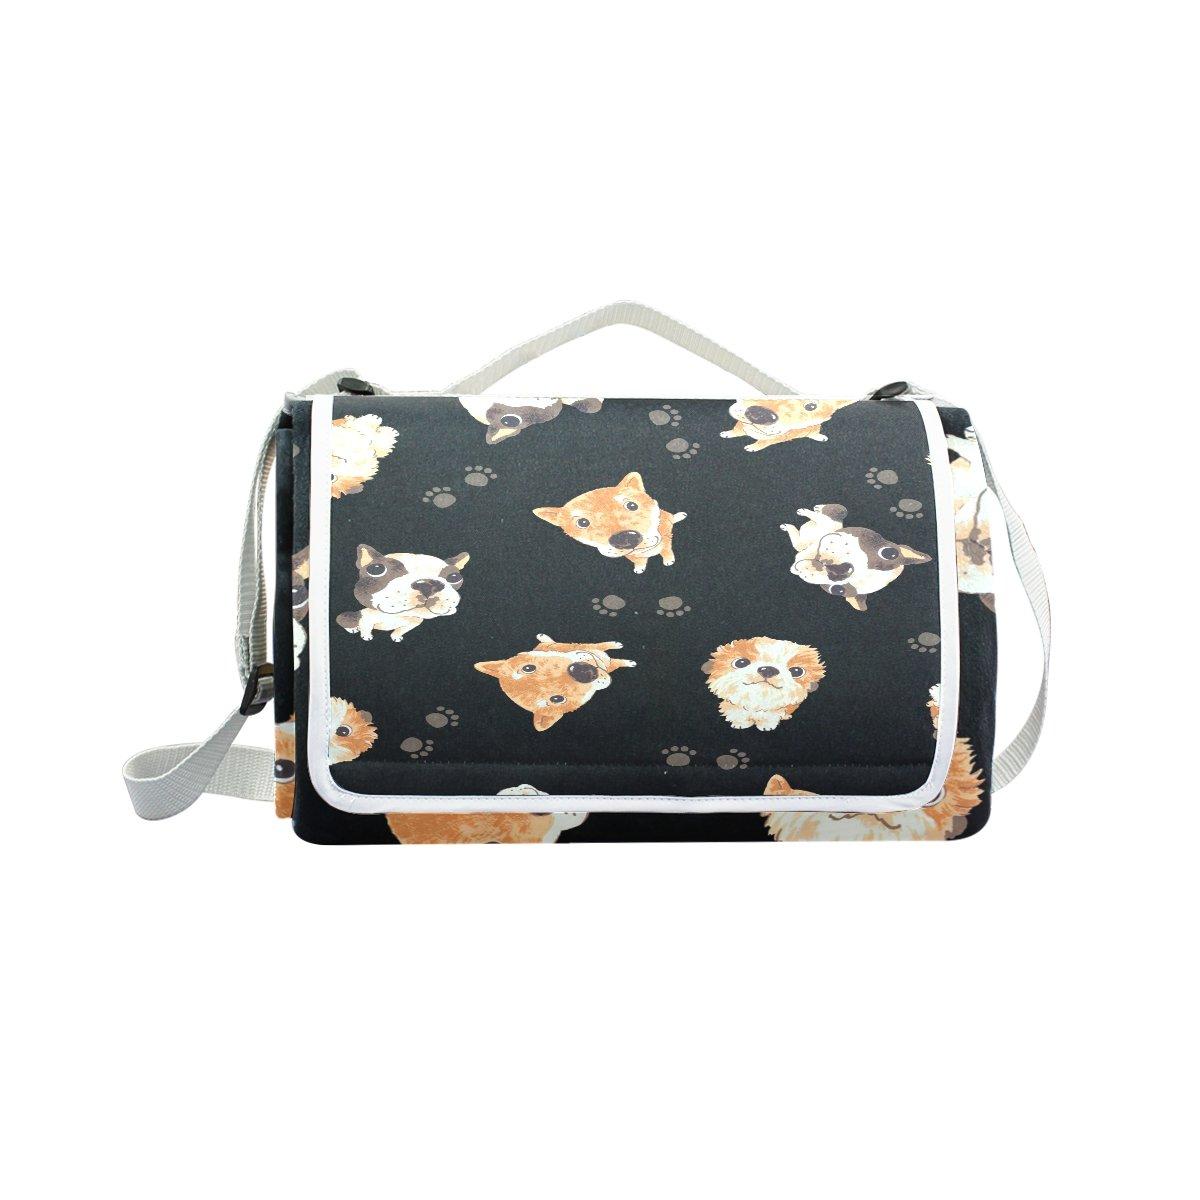 My Little Nest Outdoor Camping Picnic Beach Blanket Mat Cute Dog Lightweight Portable Folding Travel Pad 57'' x 59''